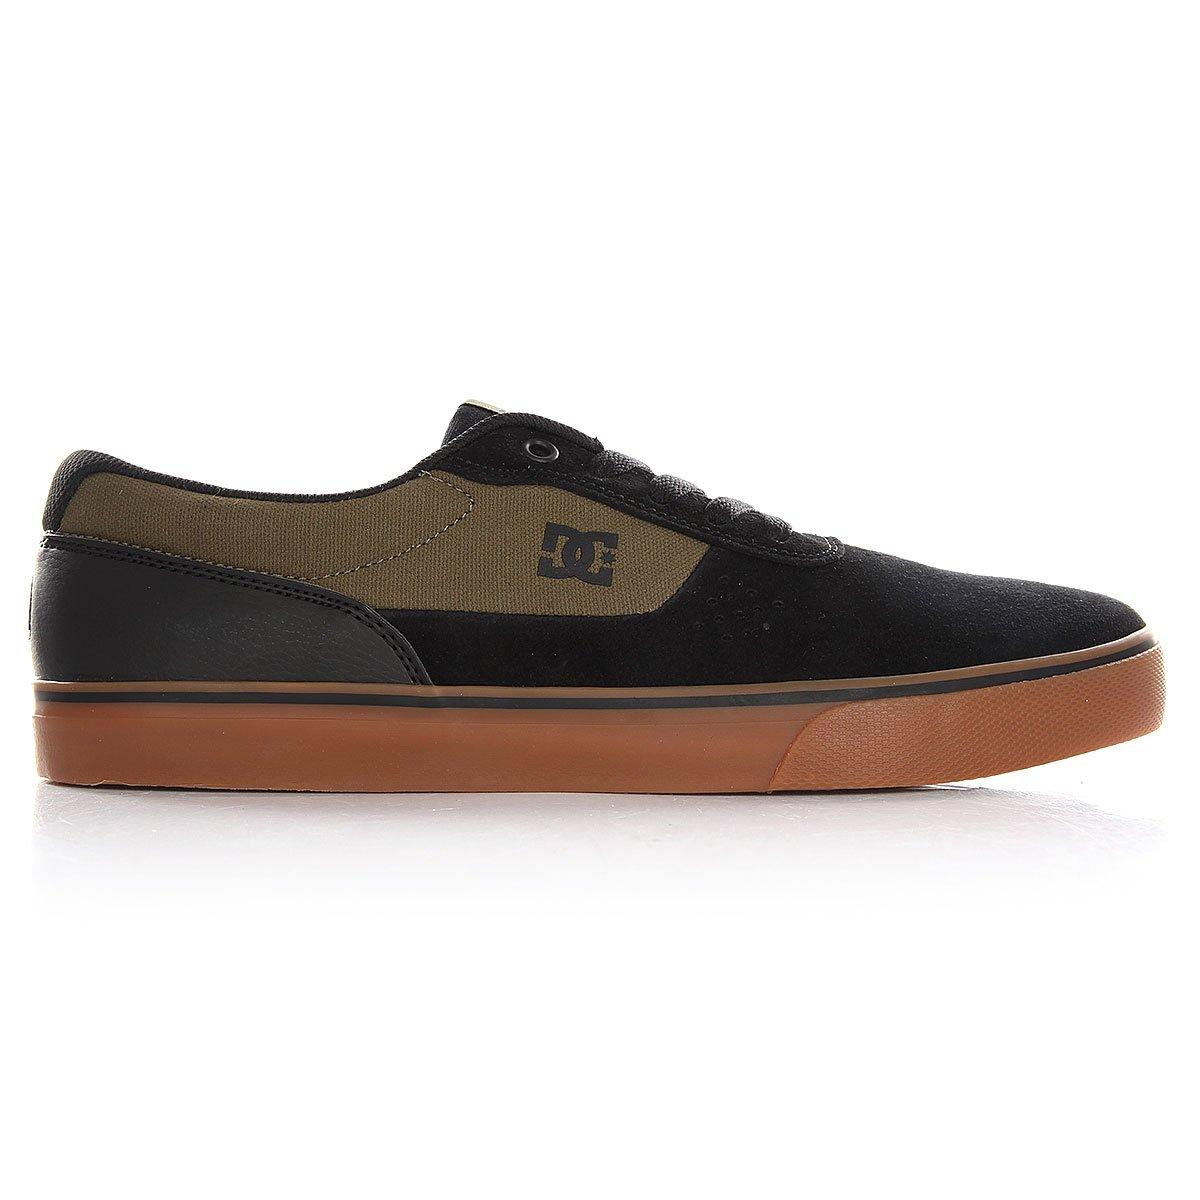 Низкие Кеды Dc Switch S M Shoe Fw17 Black/orange 7,5